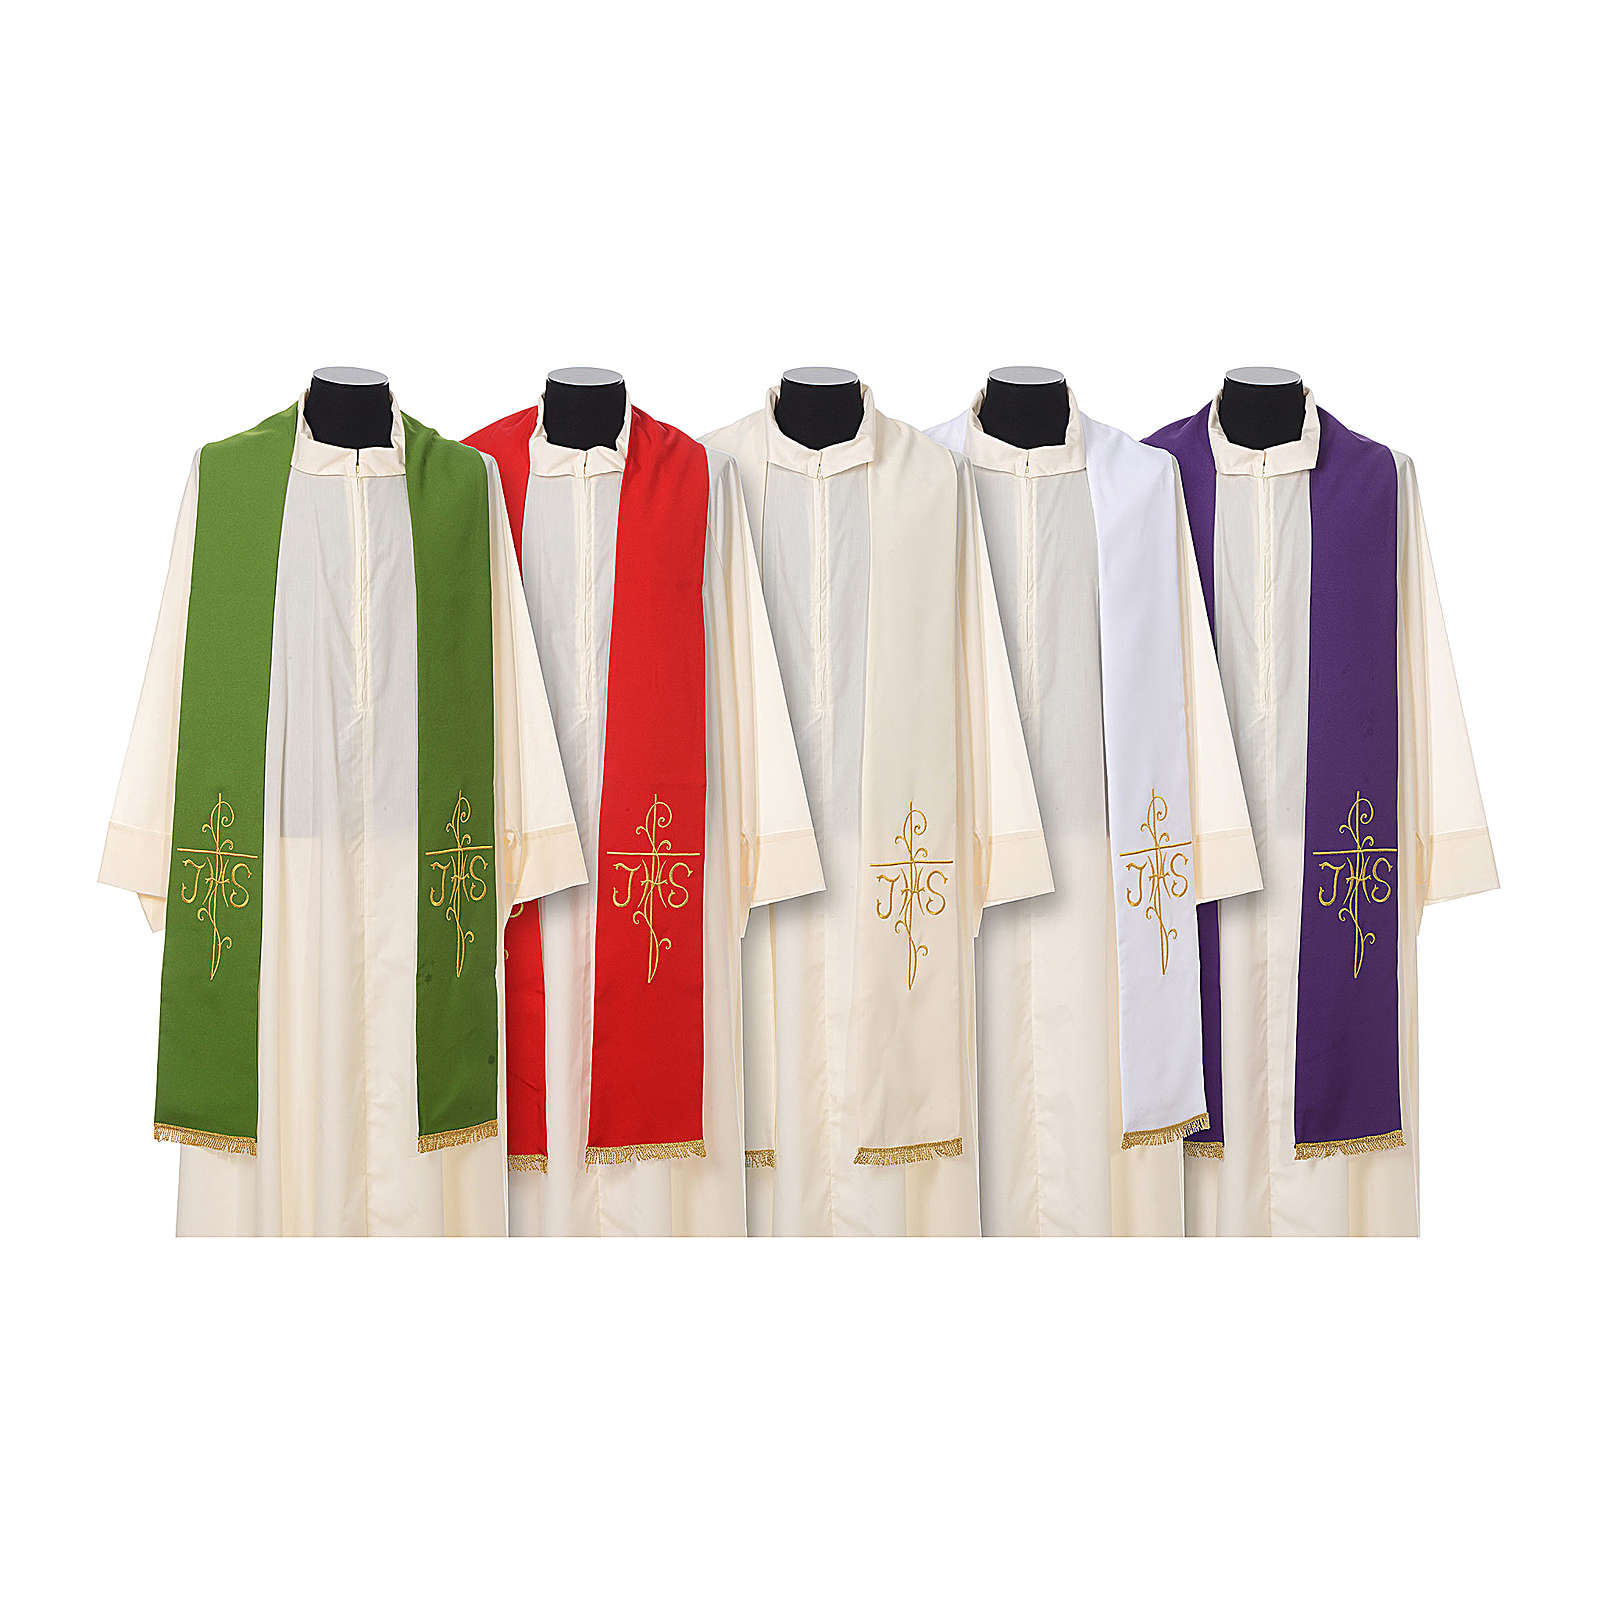 Estola sacerdotal bordado dorado cruz JHS doble cara poliéster 4